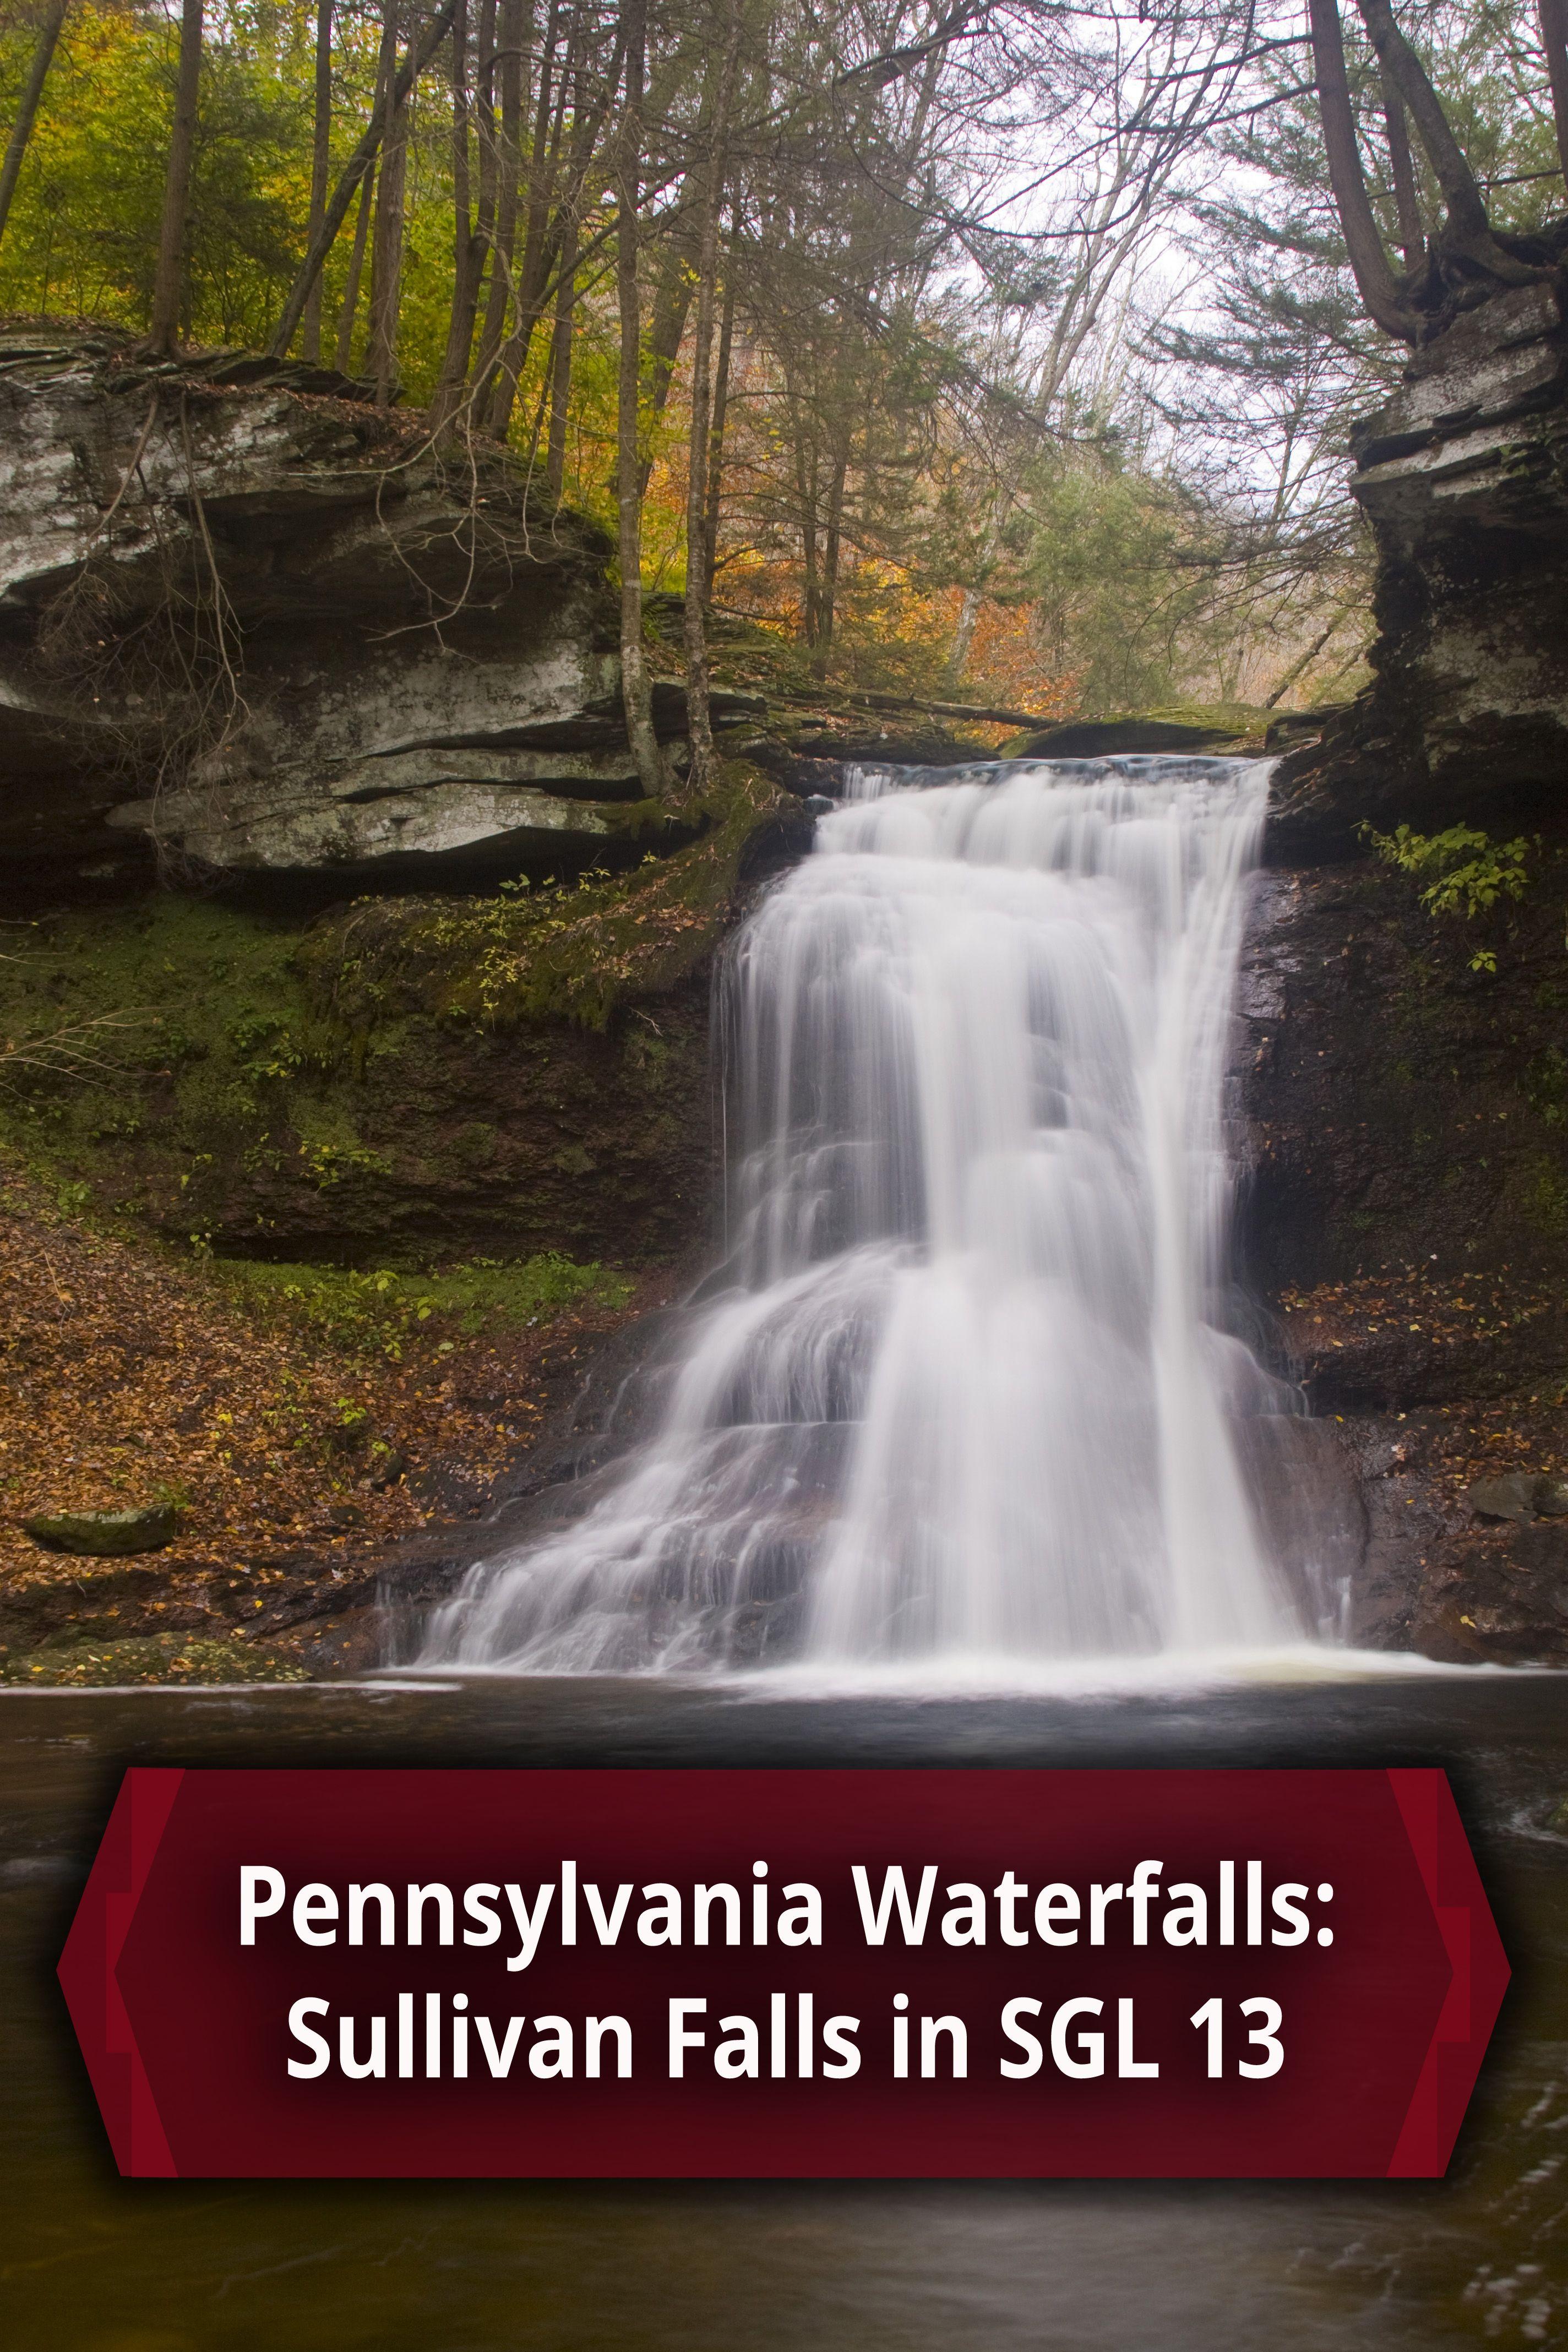 Pennsylvania Waterfalls Visiting Sullivan Falls in State